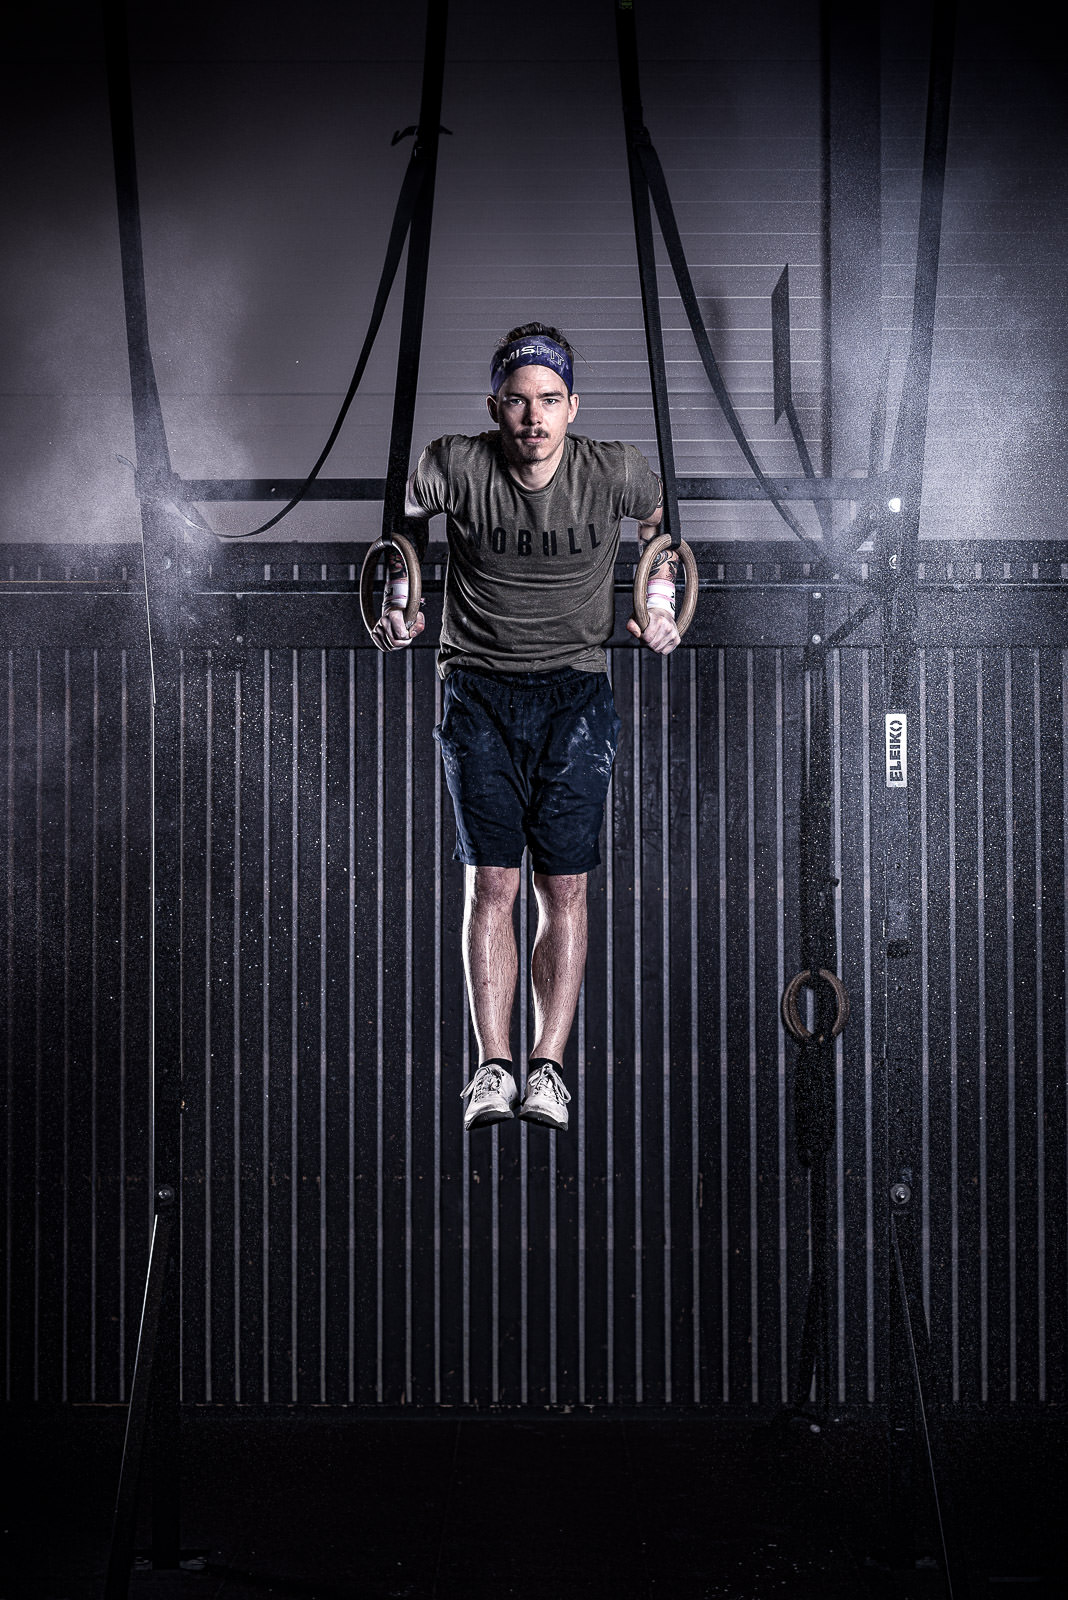 STC-CrossFit442-Wallfoto_161218_009